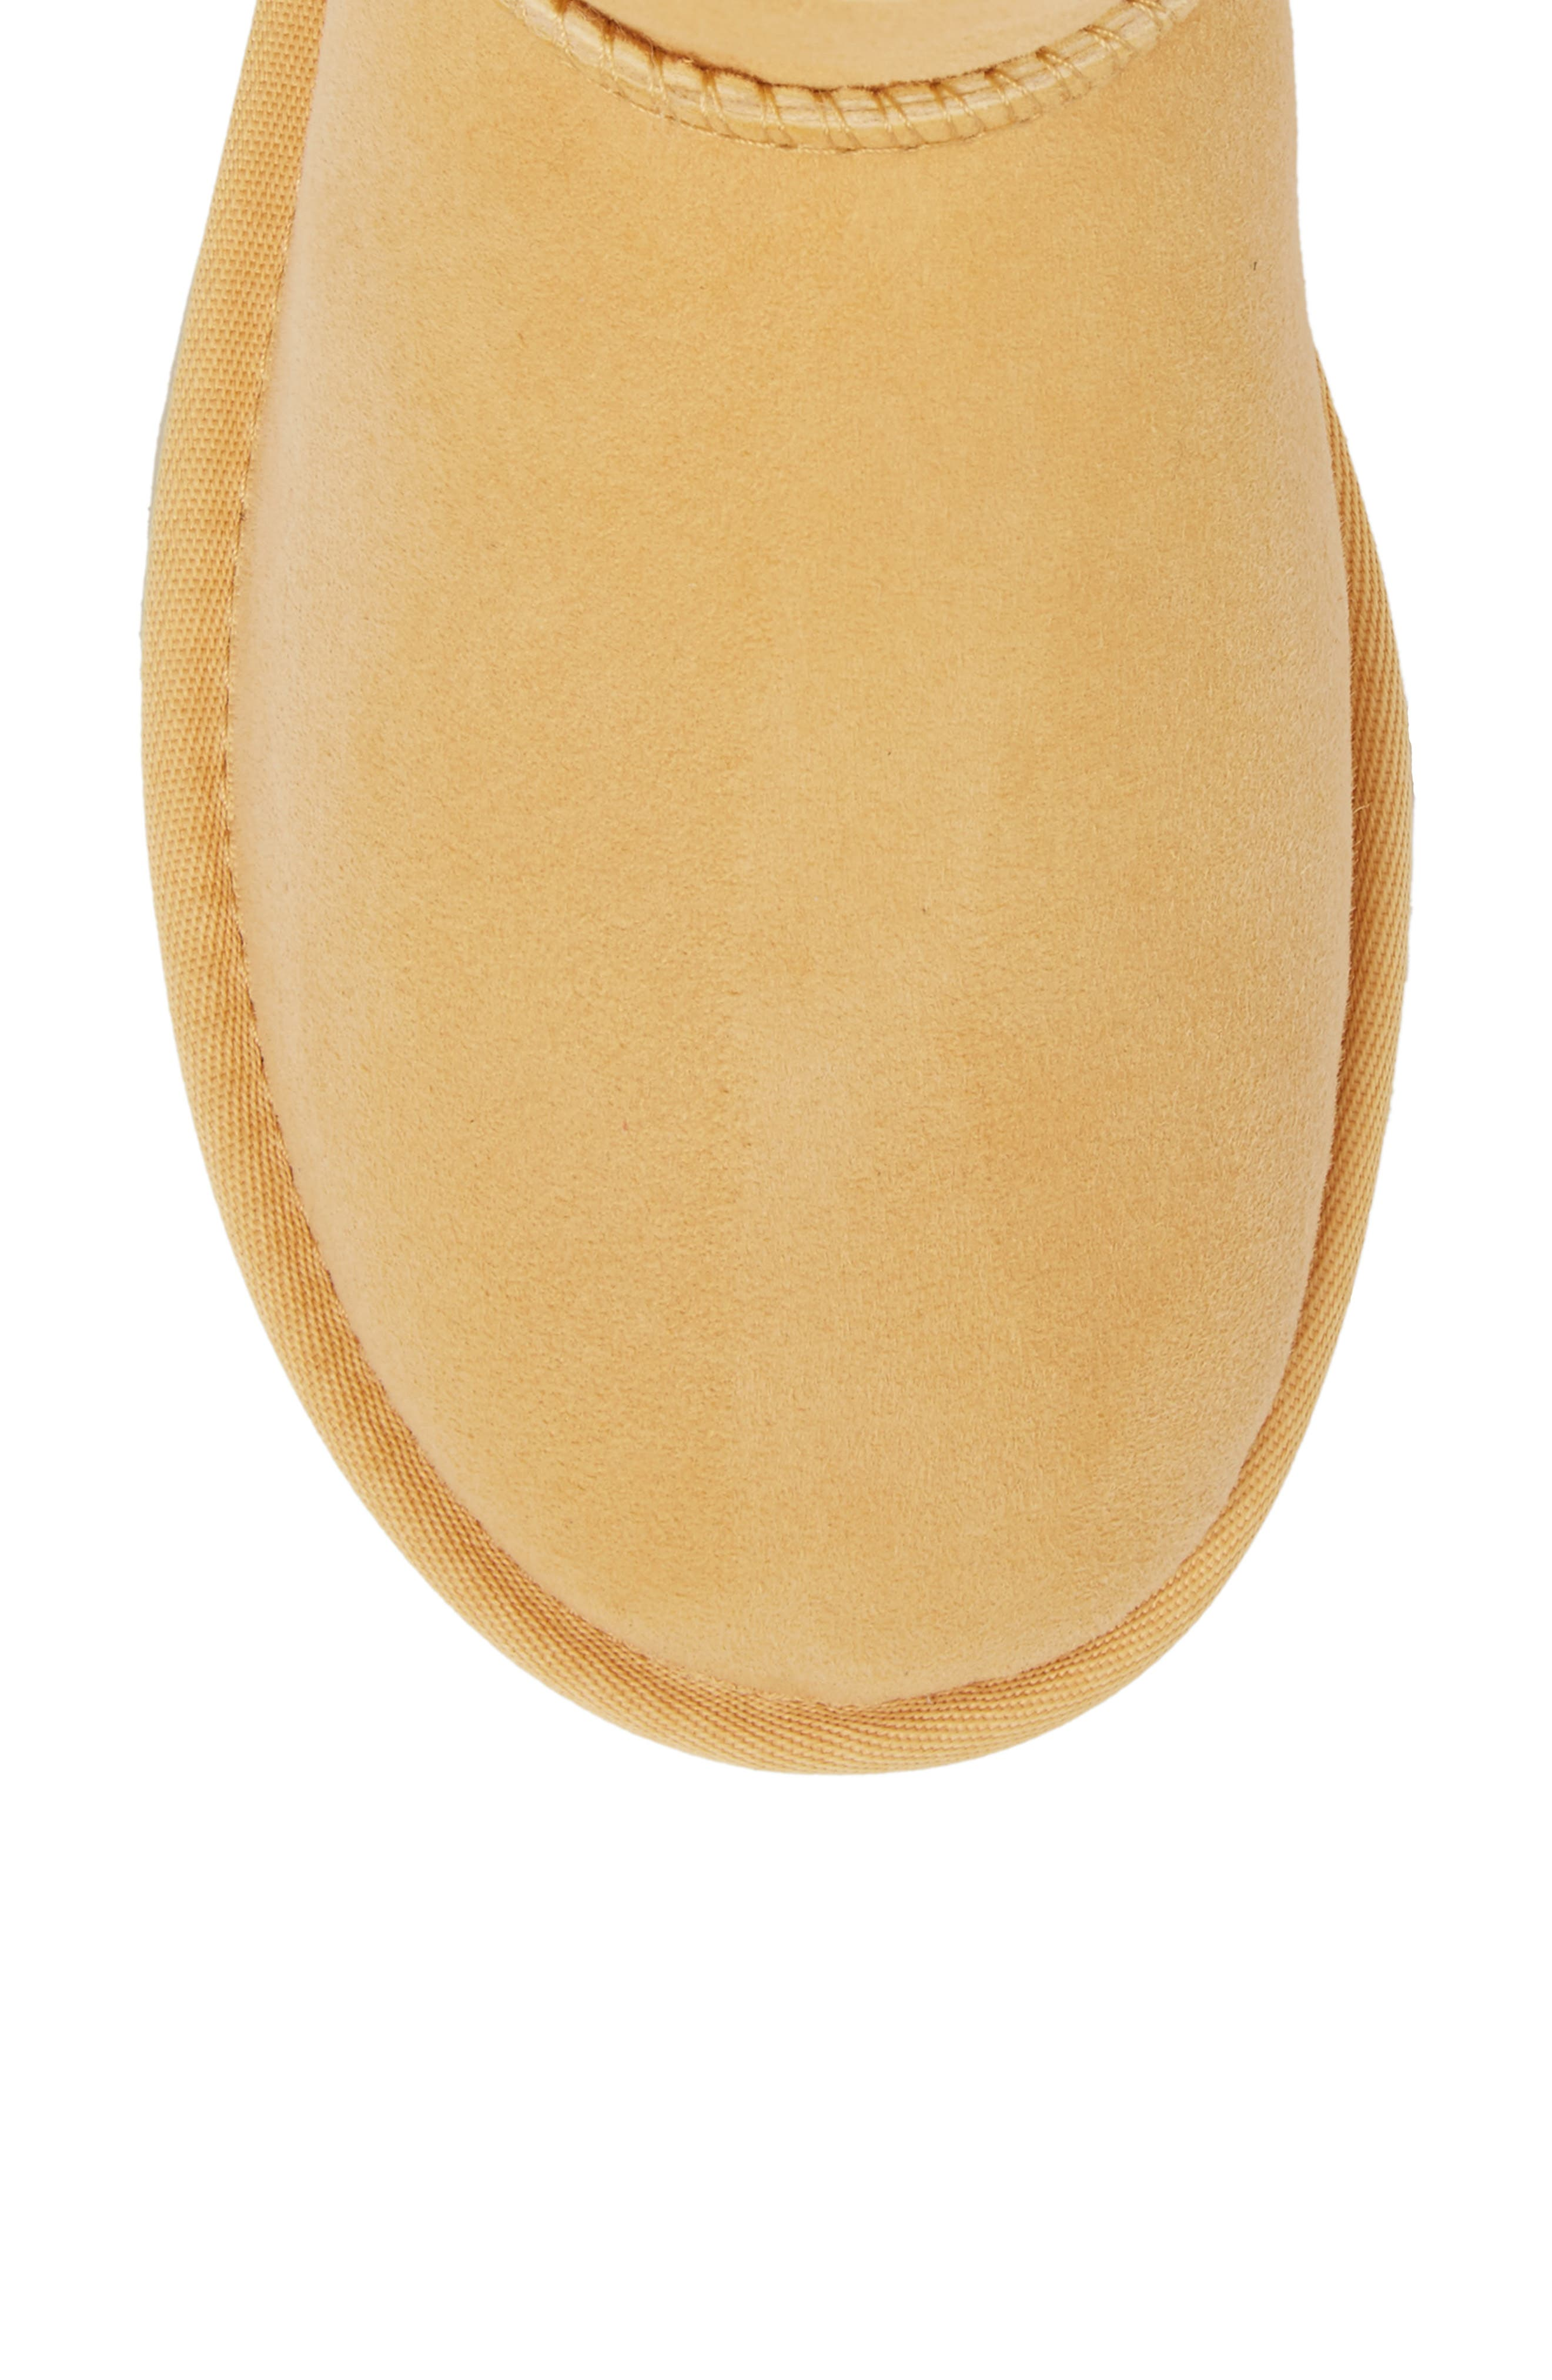 ,                             Classic Mini II Genuine Shearling Lined Boot,                             Alternate thumbnail 85, color,                             700